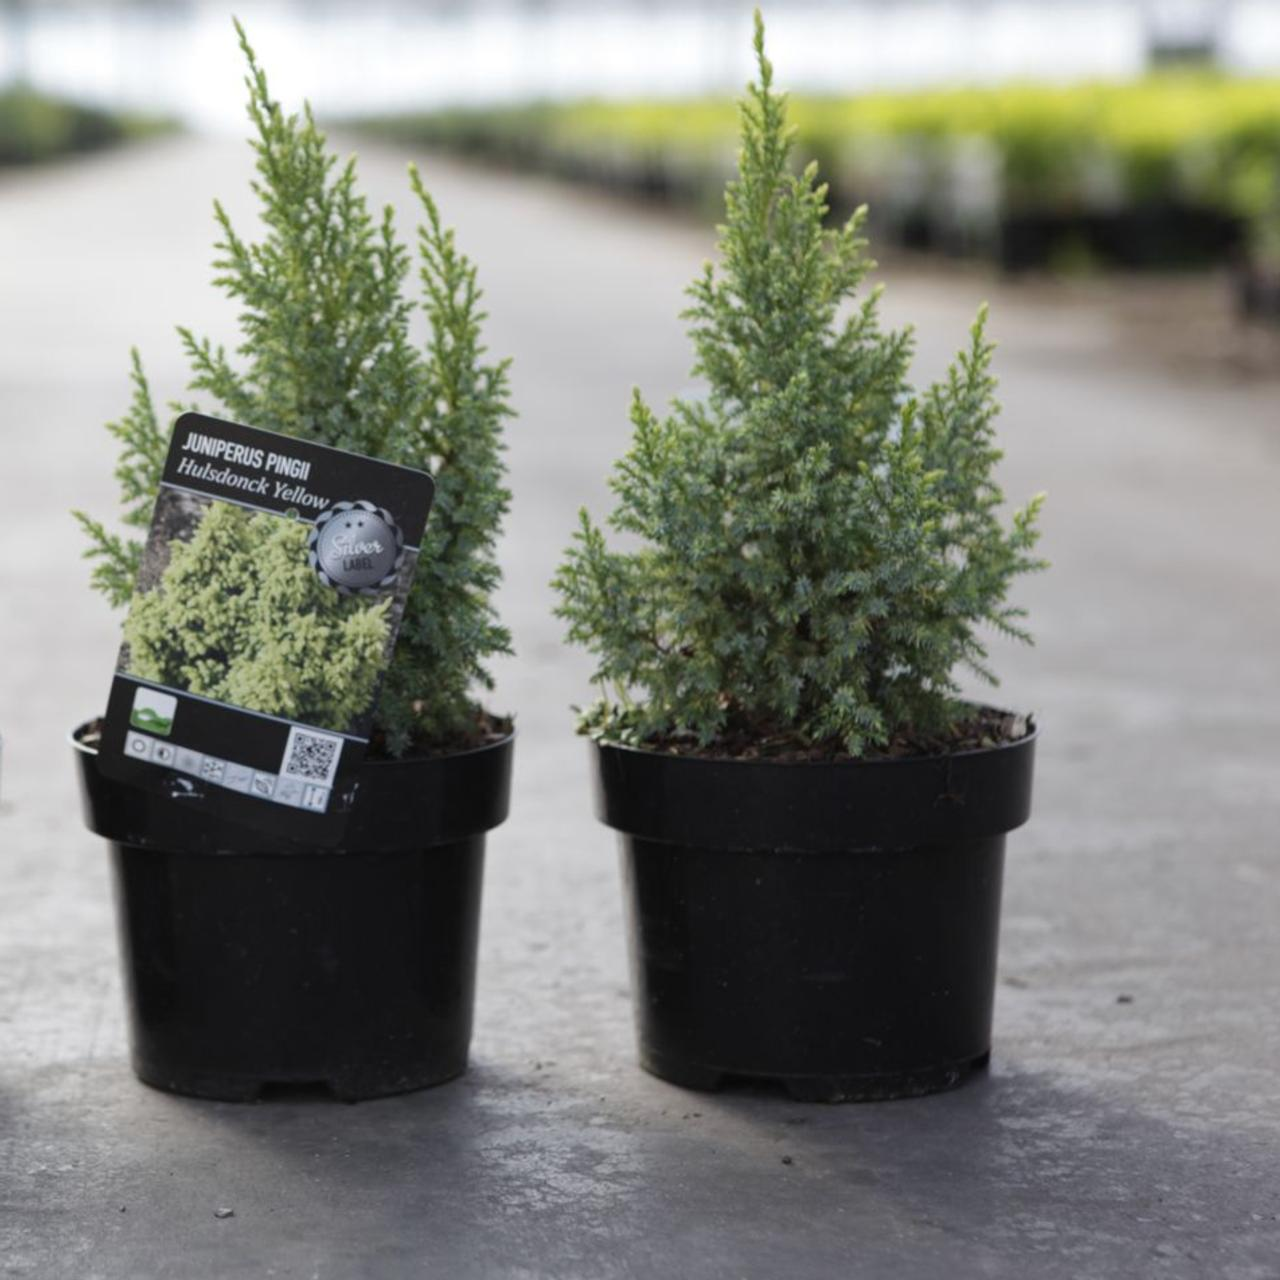 Juniperus pingii 'Hulsdonck Yellow' plant